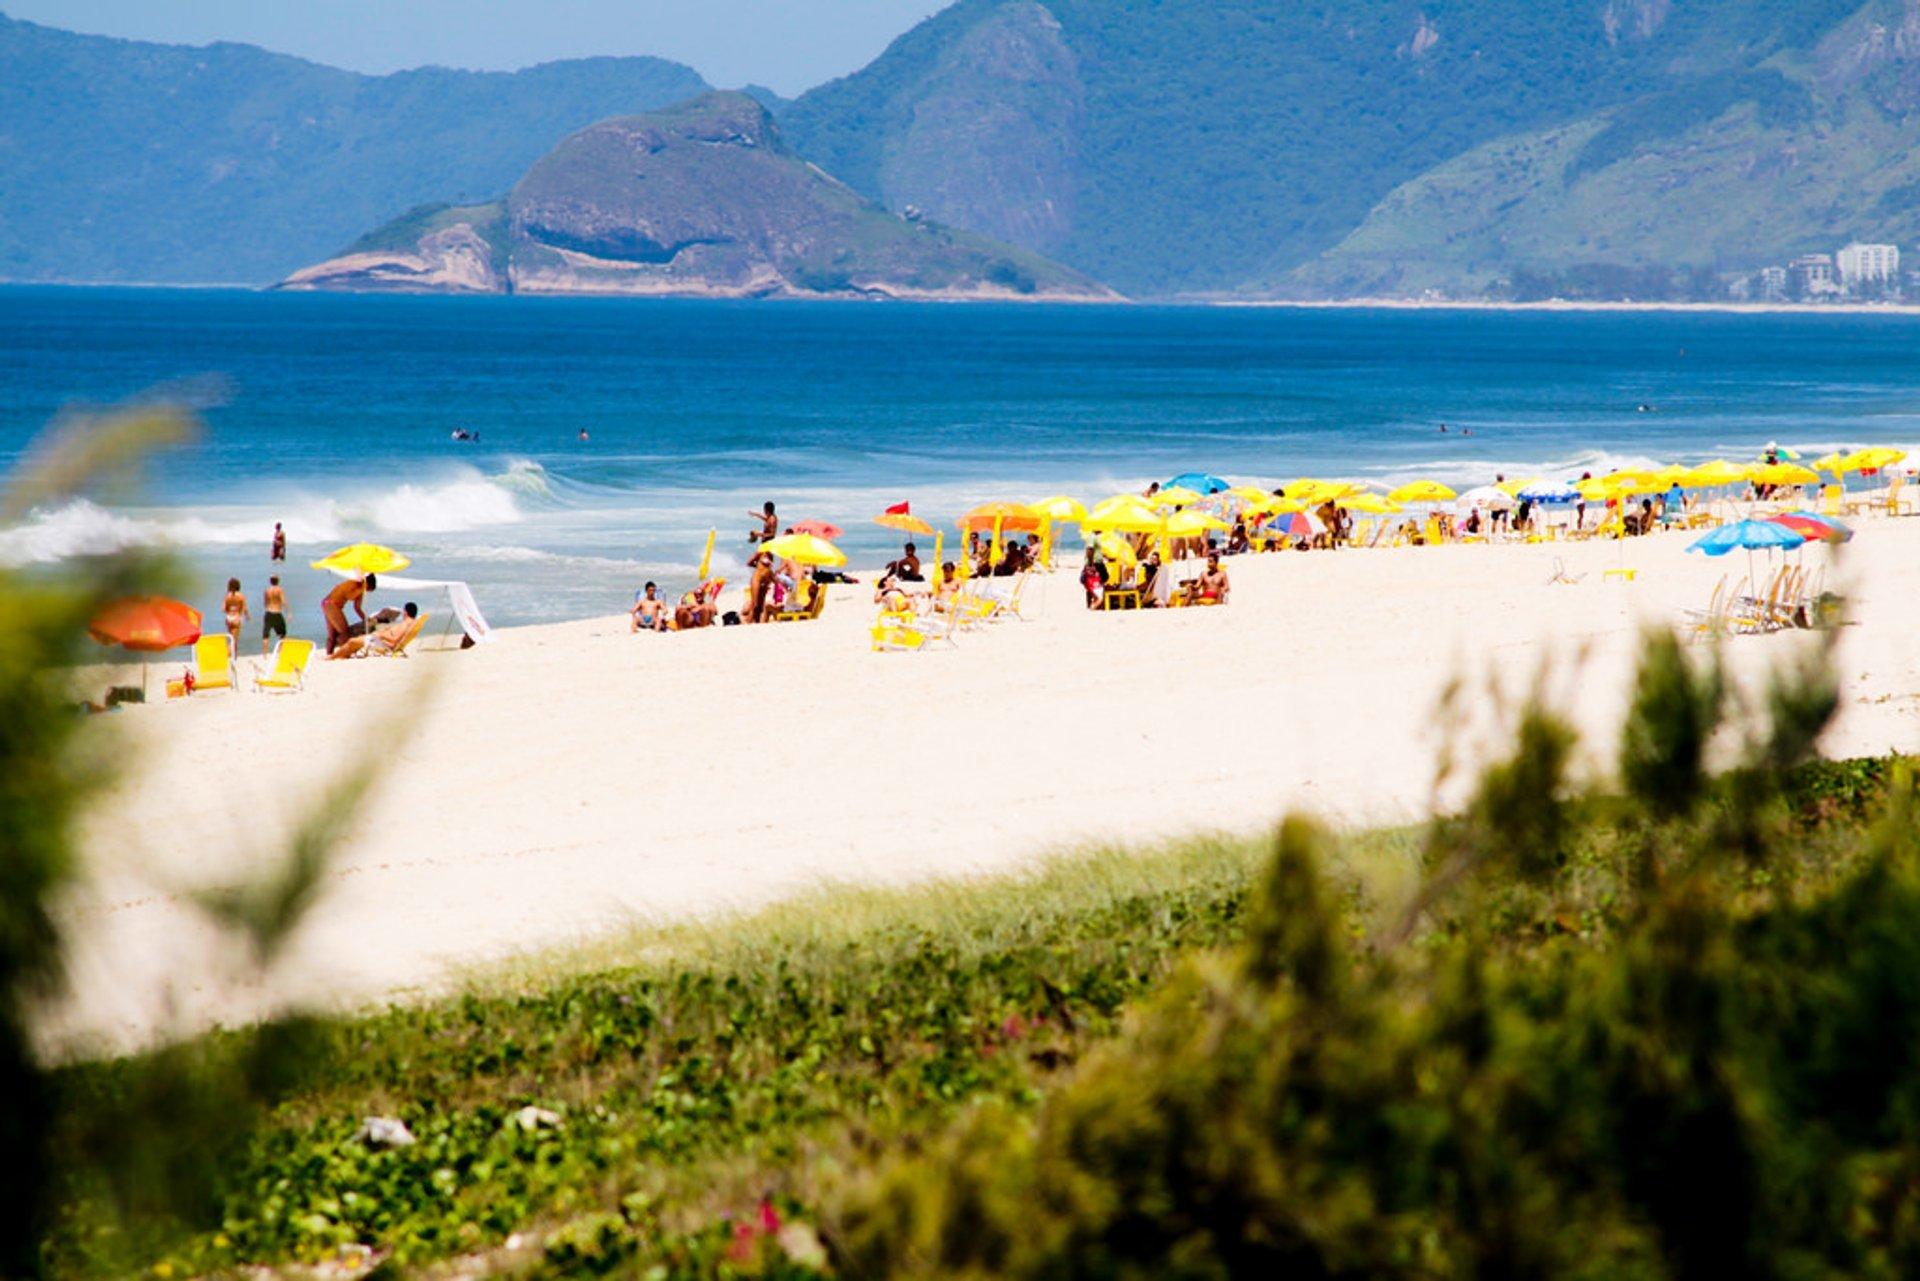 Beach Season in Rio de Janeiro 2019 - Best Time